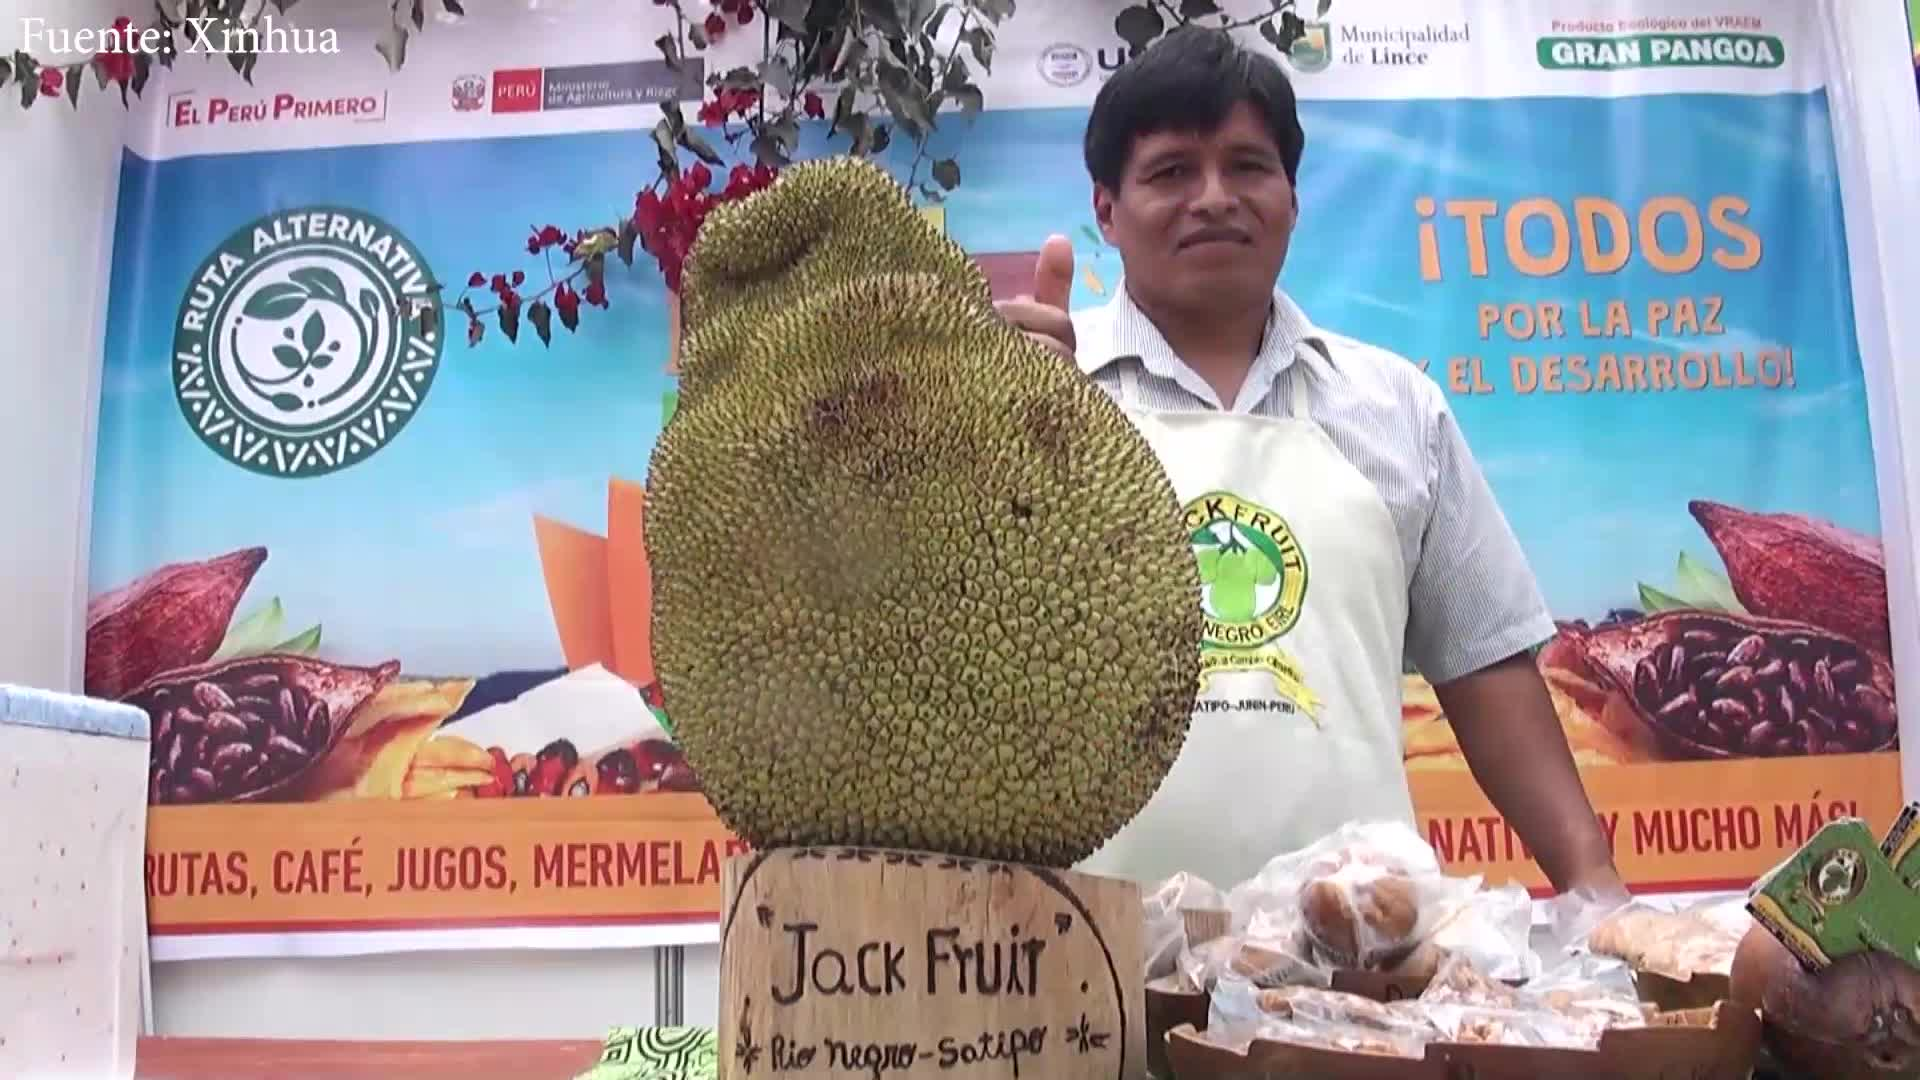 Frutos amazónicos llegan a la capital peruana